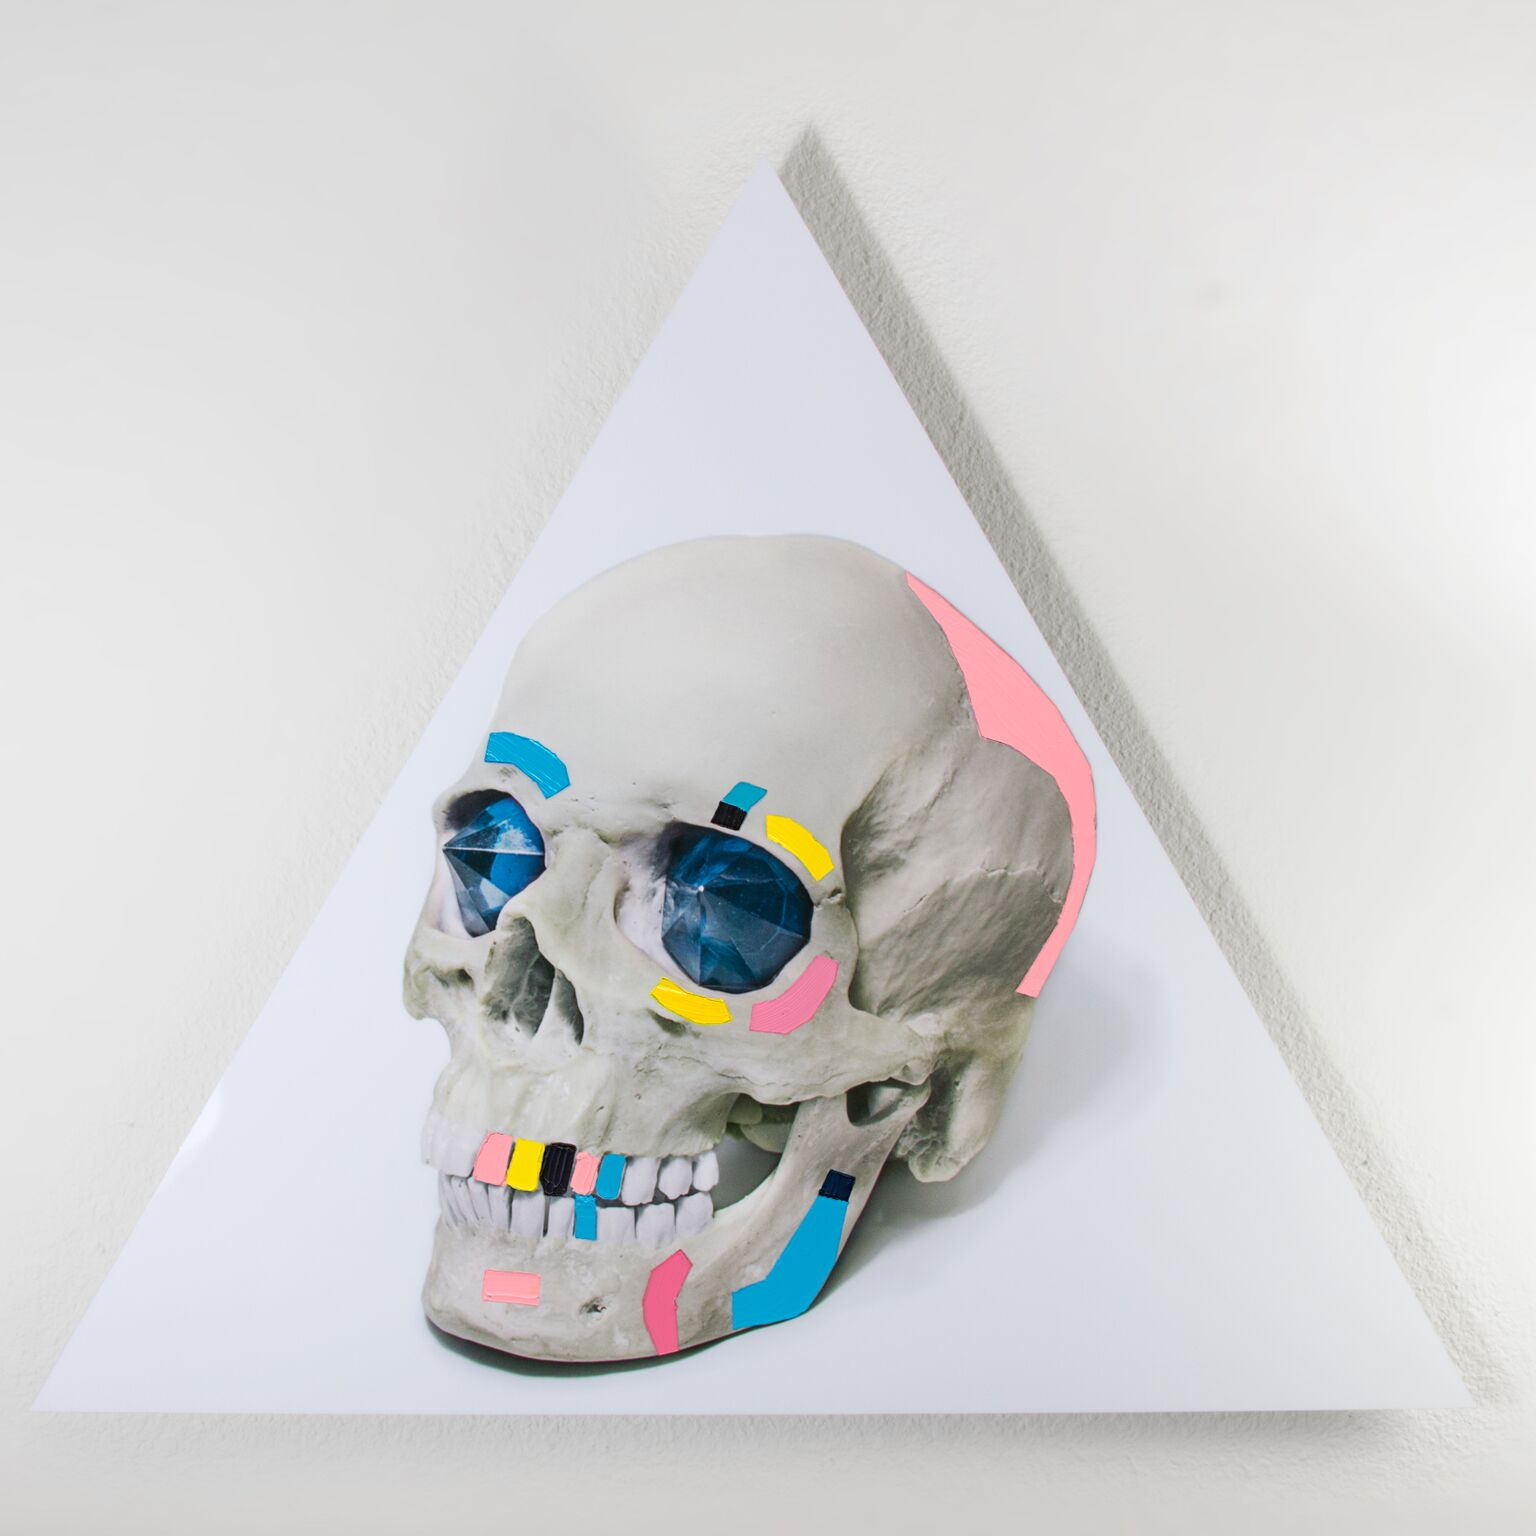 2_Ancient_Gods_Human_Skull_Victor_Koroma_preview.jpg